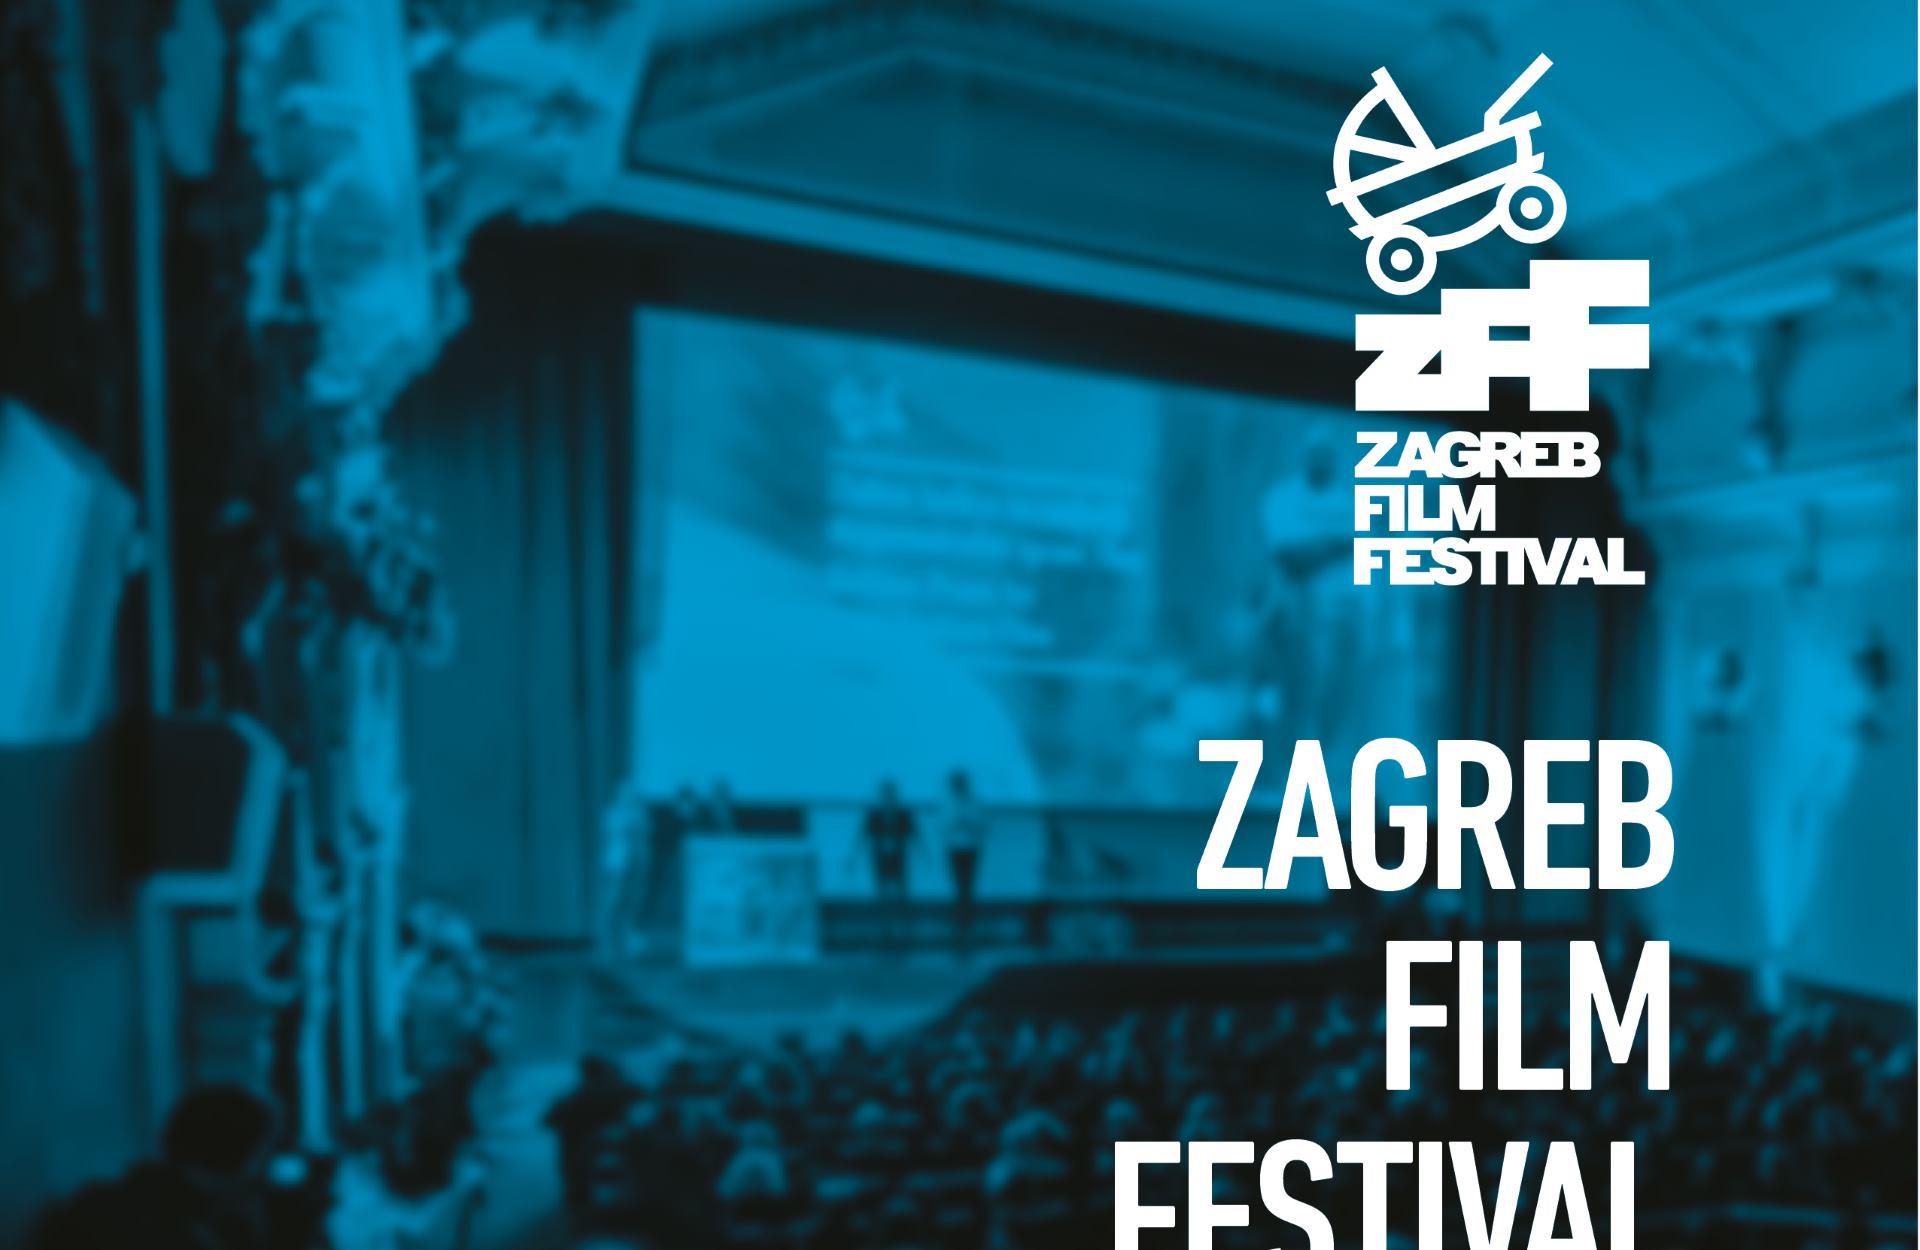 ZAGREB FILM FESTIVAL Devet festivalskih dana i najzanimljiviji filmovi dugog i kratkog metra